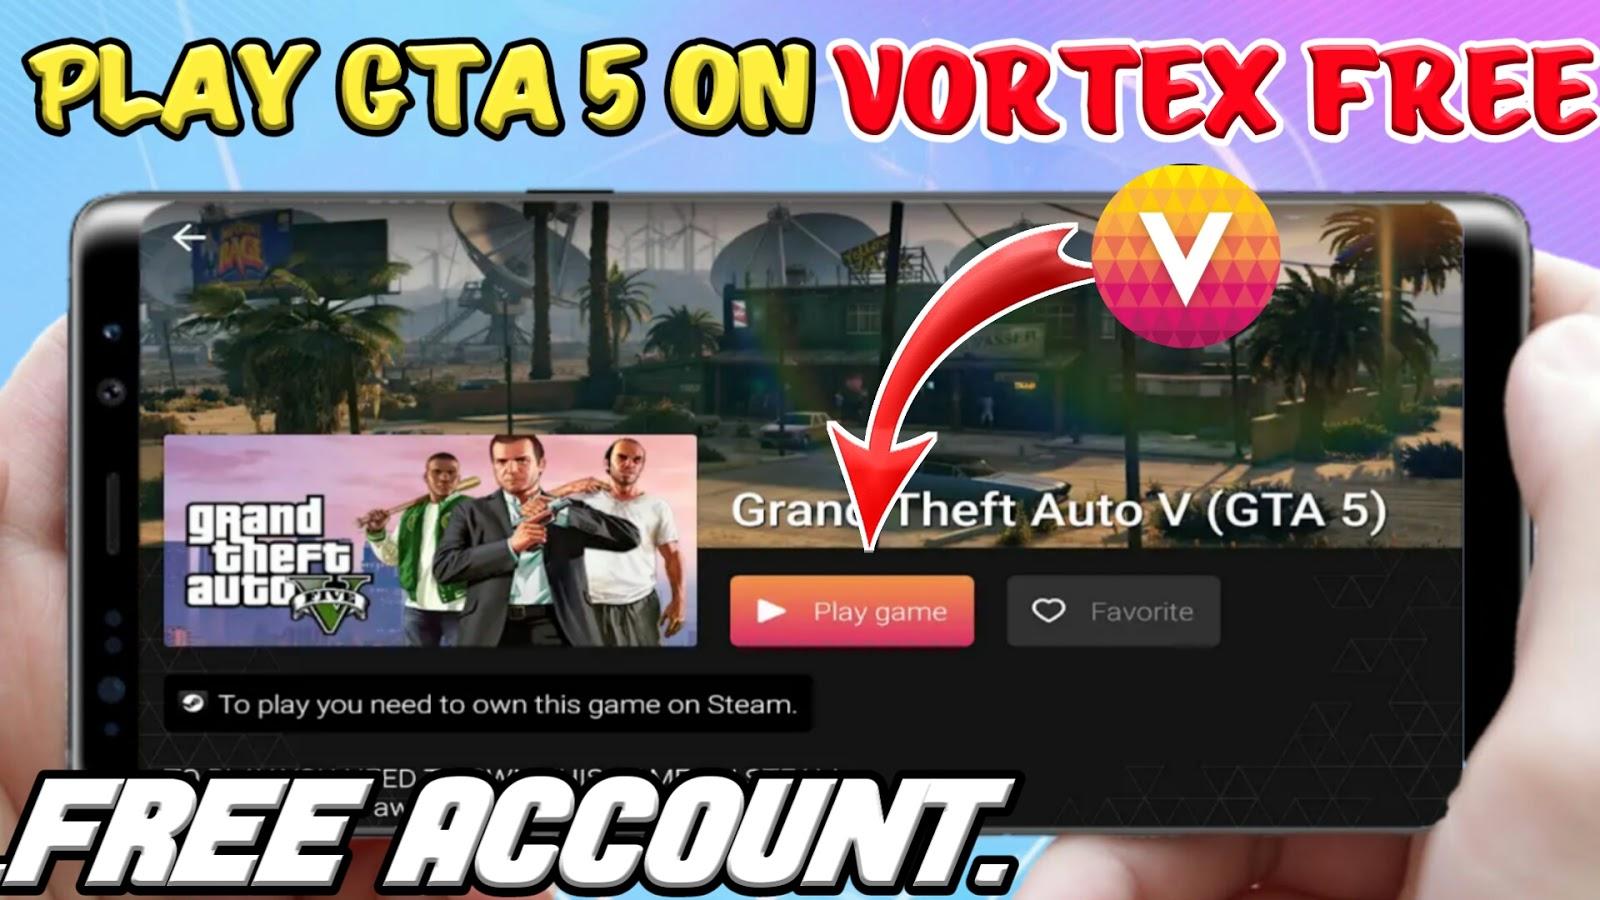 VORTEX GAMING HA/@ APK DOWNLOAD